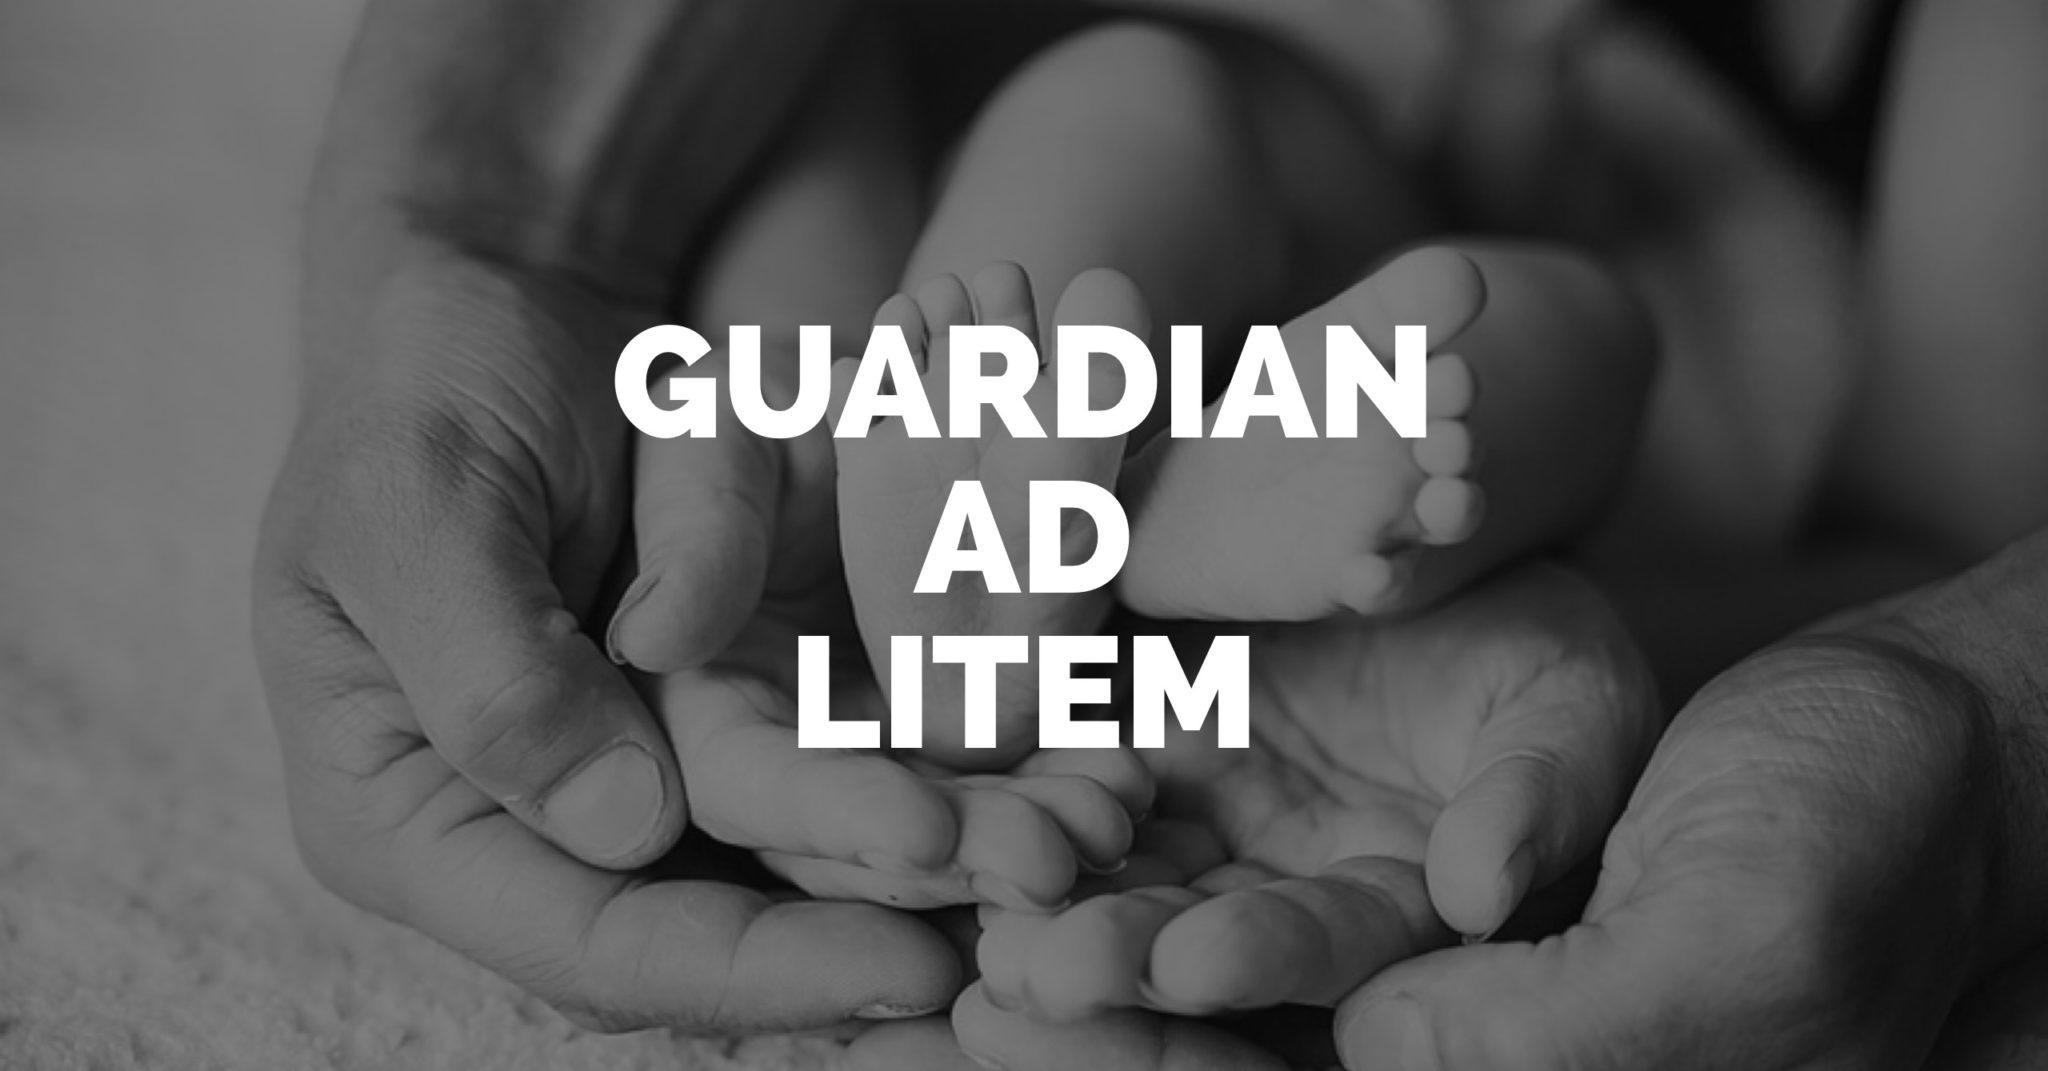 guardian-ad-litem